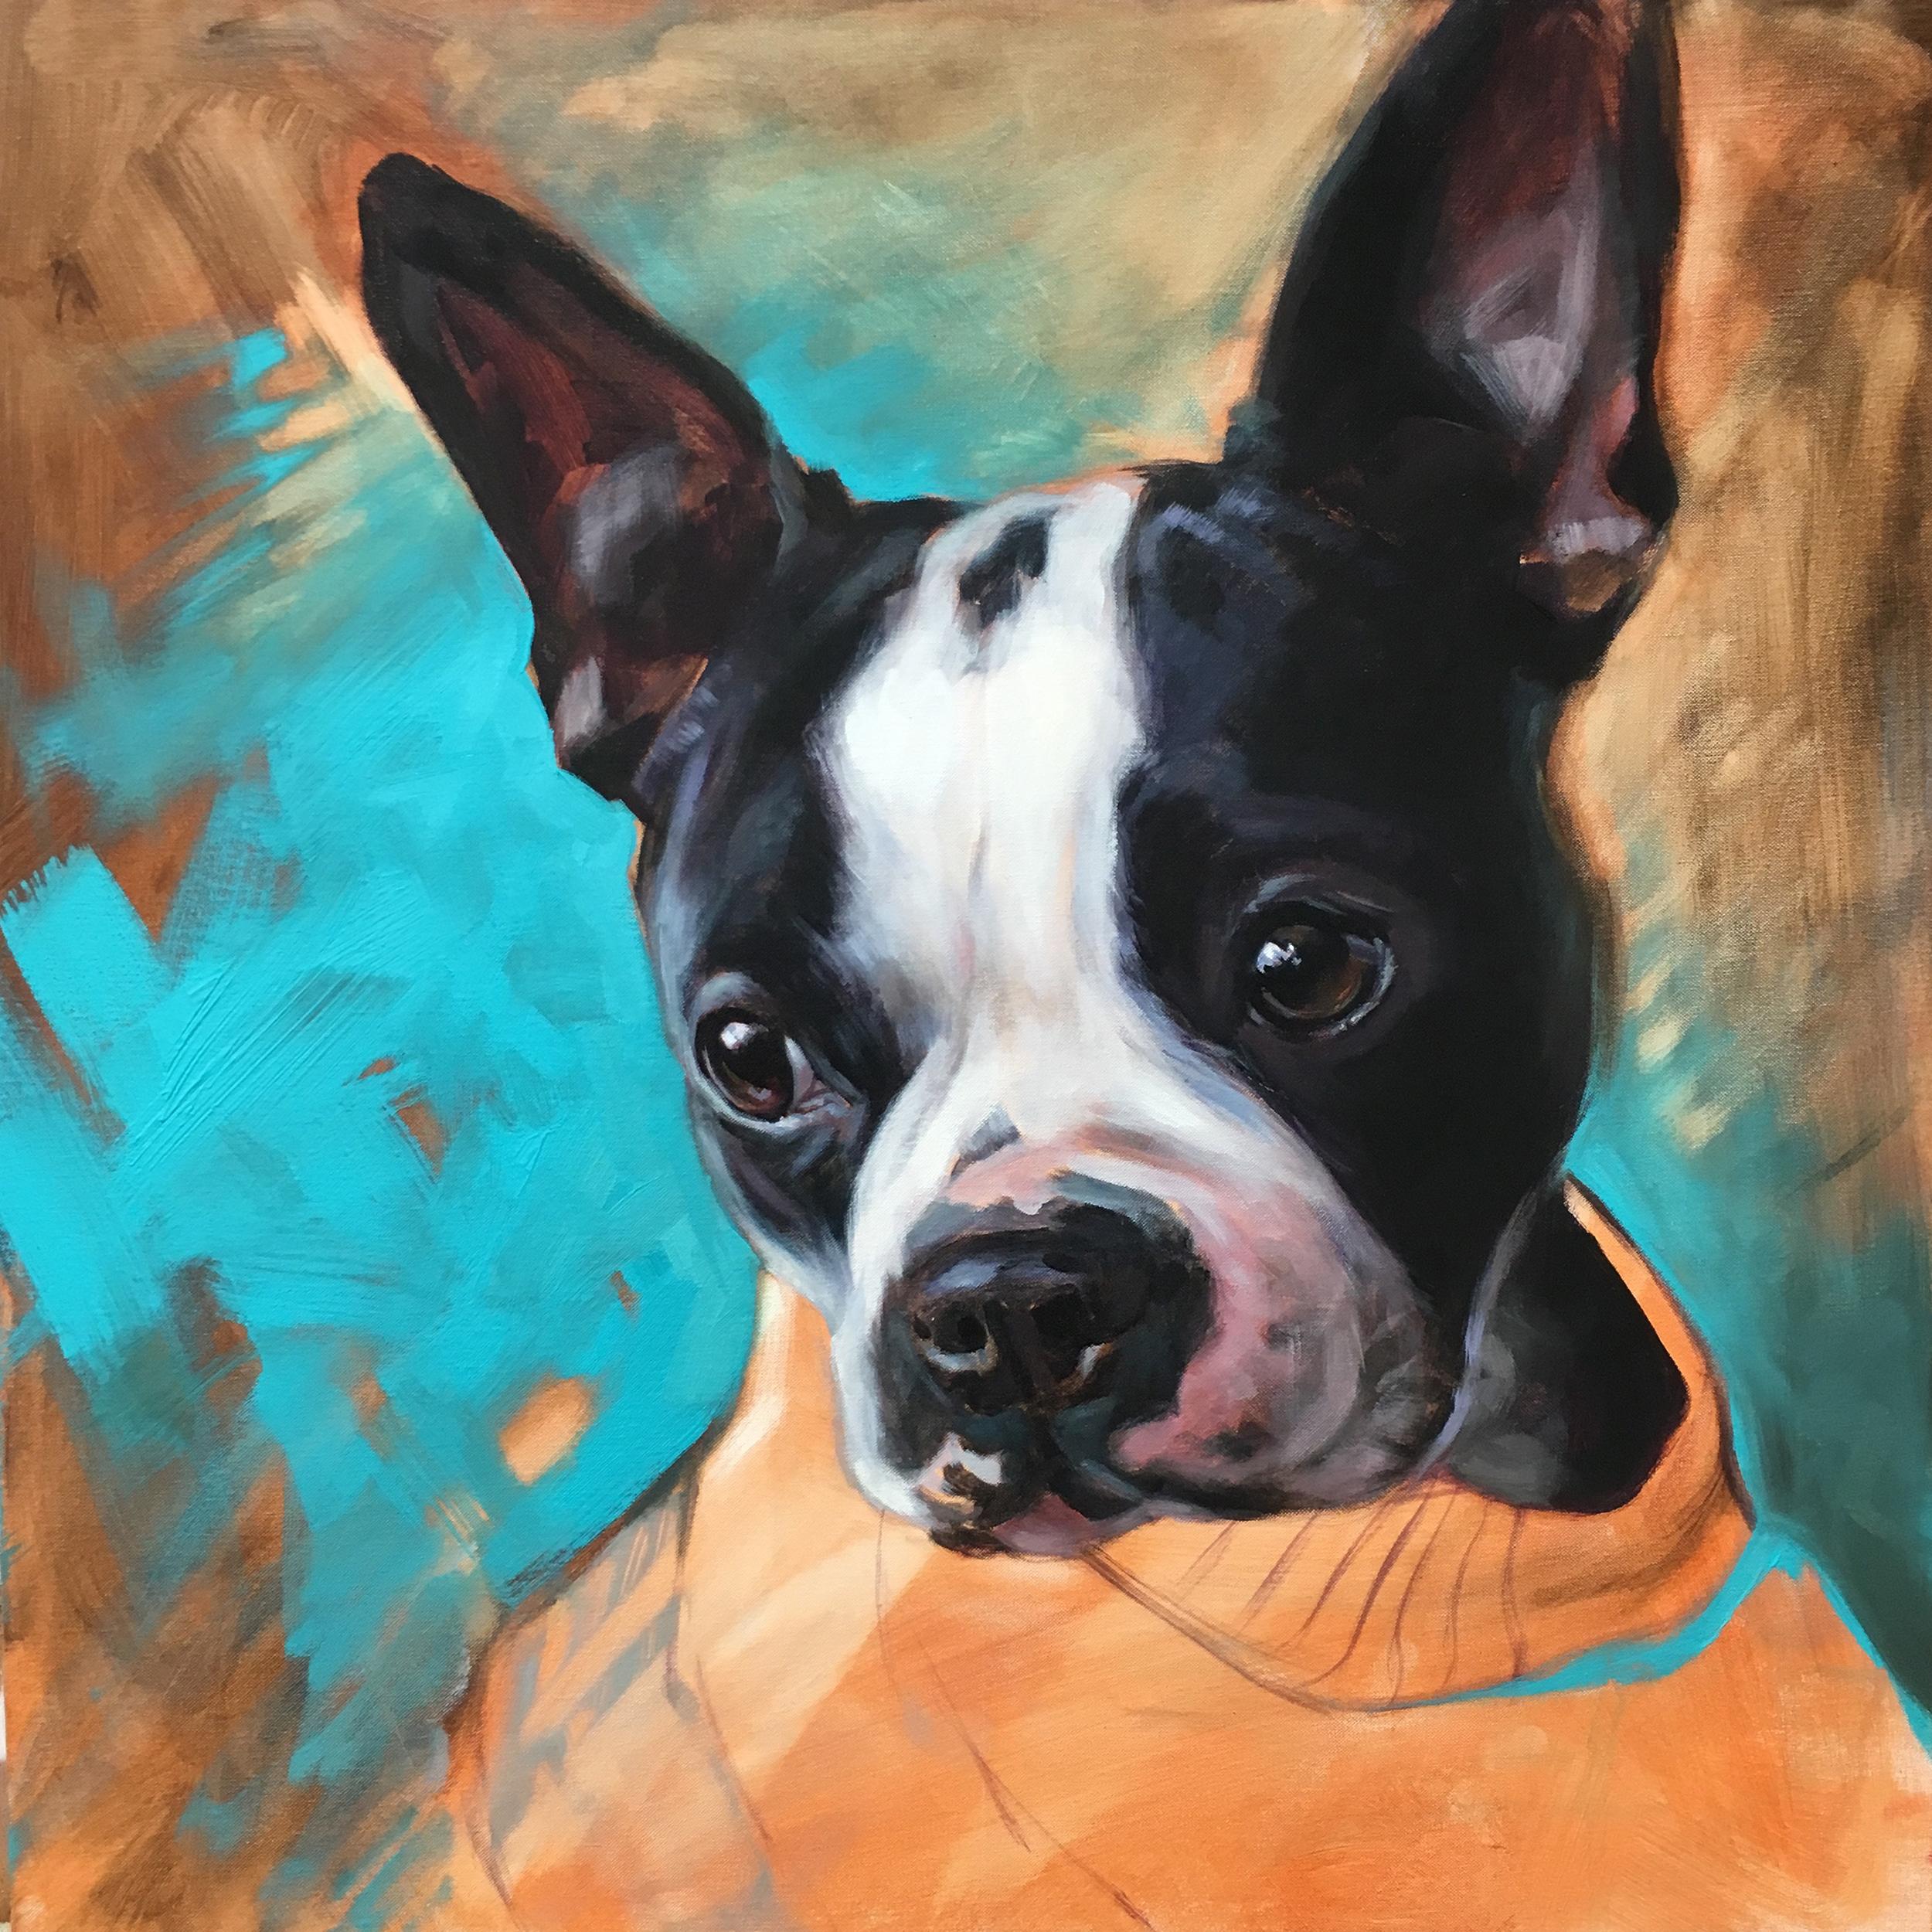 """Pancake"" (Boston Terrier) | 2019 | 20"" x 20"" | Acrylic on canvas | (Sold)"